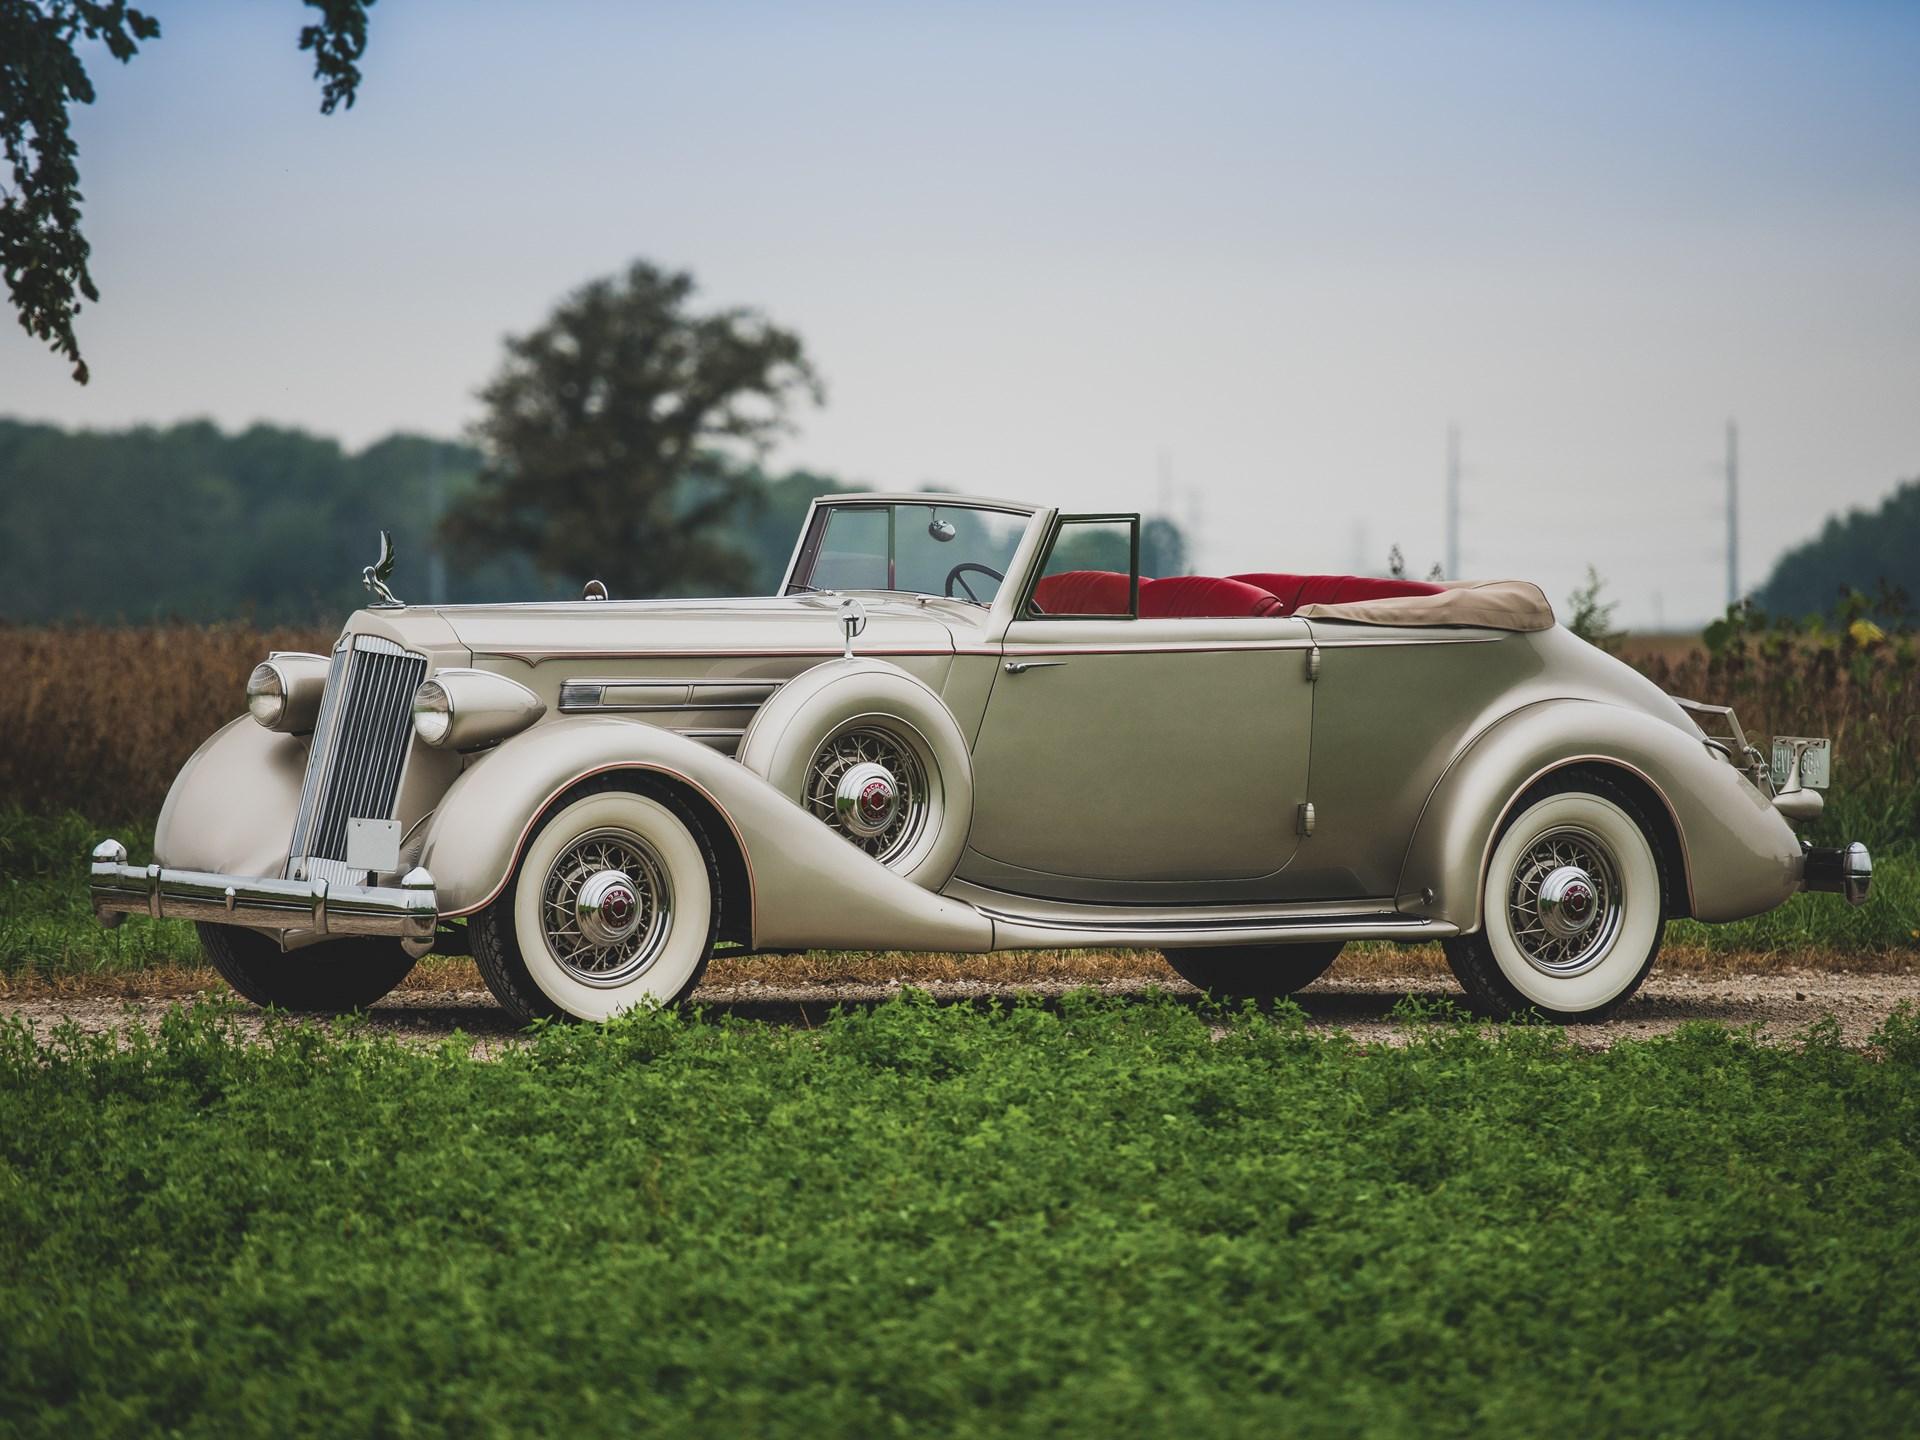 Image result for rm hershey 1936 Packard Twelve Convertible Victoria